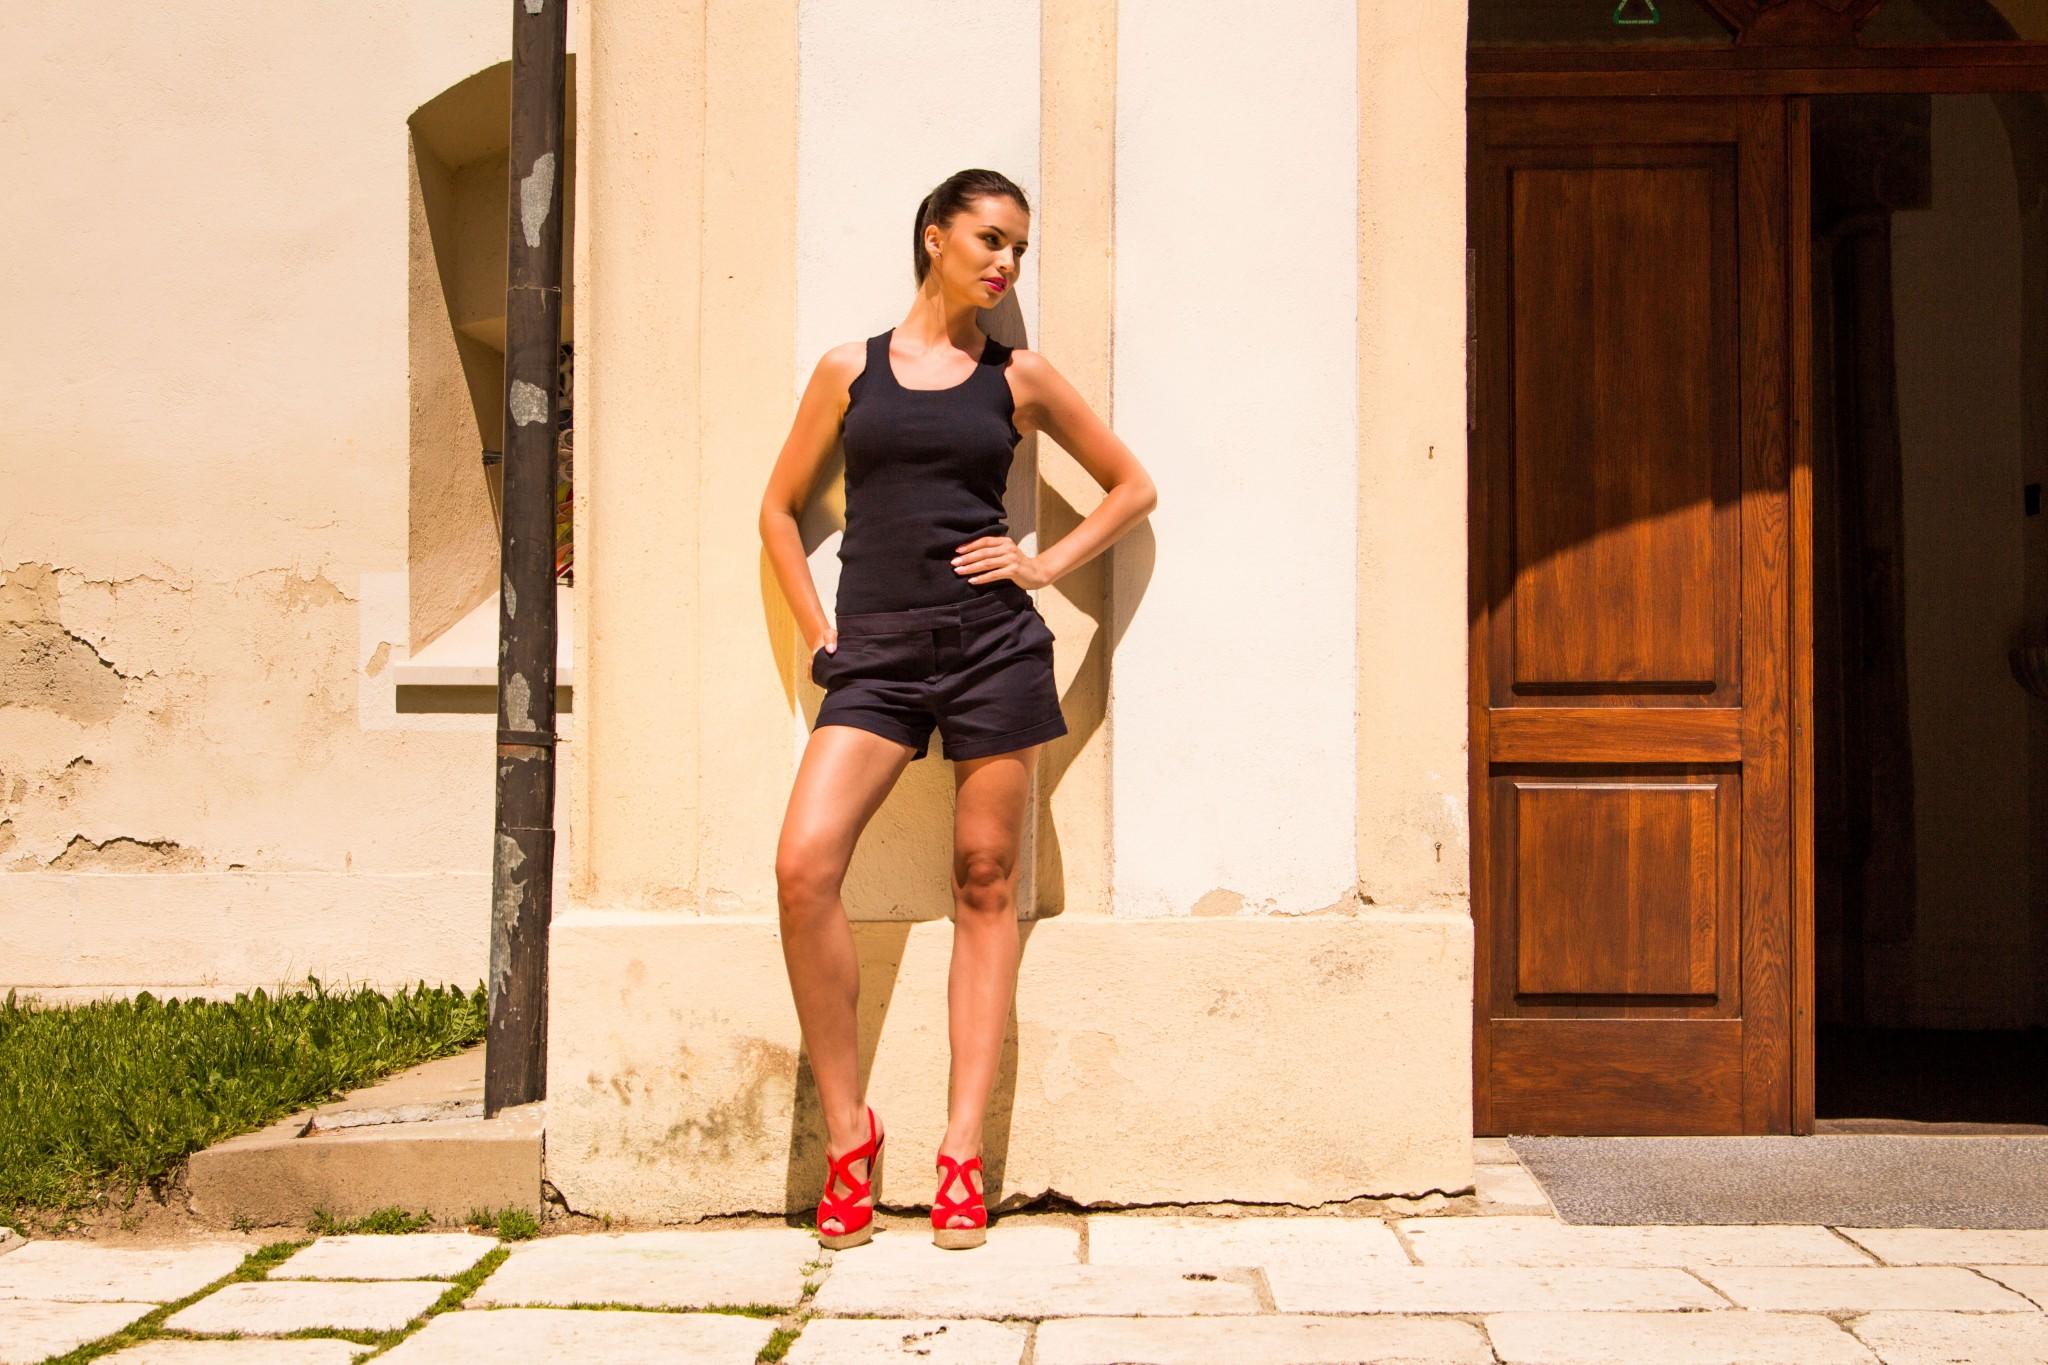 Fashion po Španielsky s Espadrille